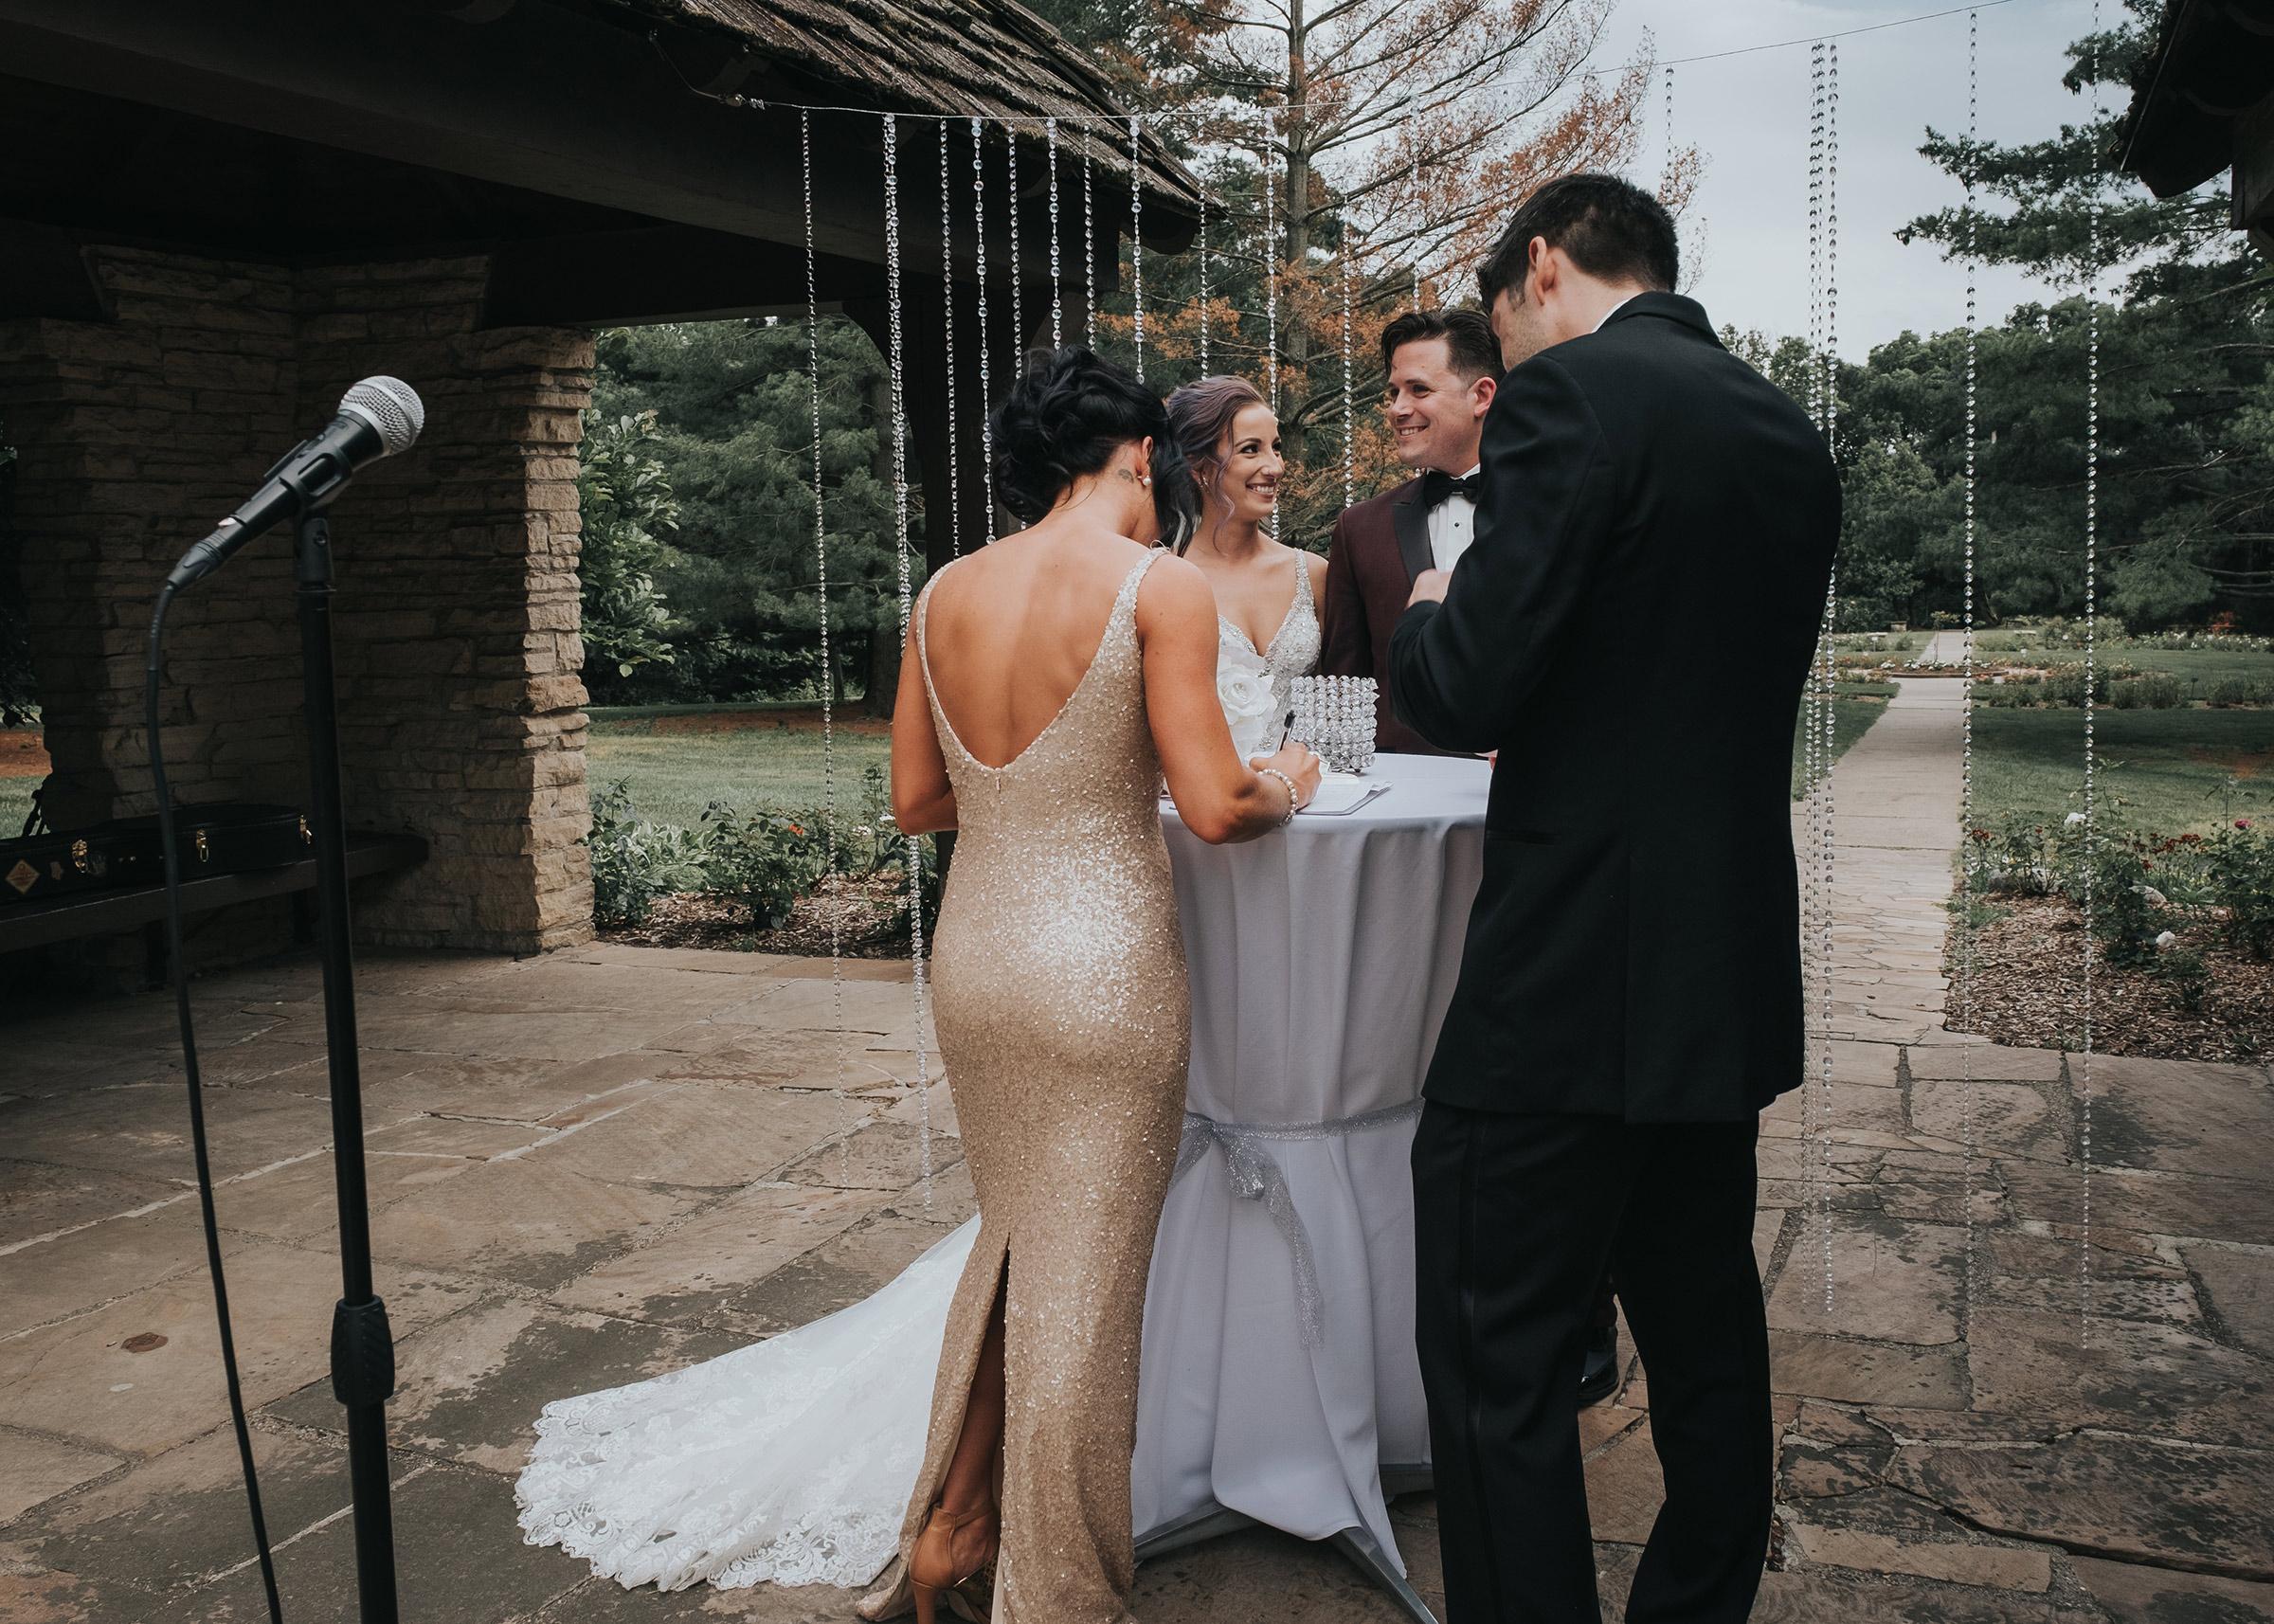 wedding-couple-signing-marriage-liscense-desmoines-iowa-rose-garden-raelyn-ramey-photography.jpg